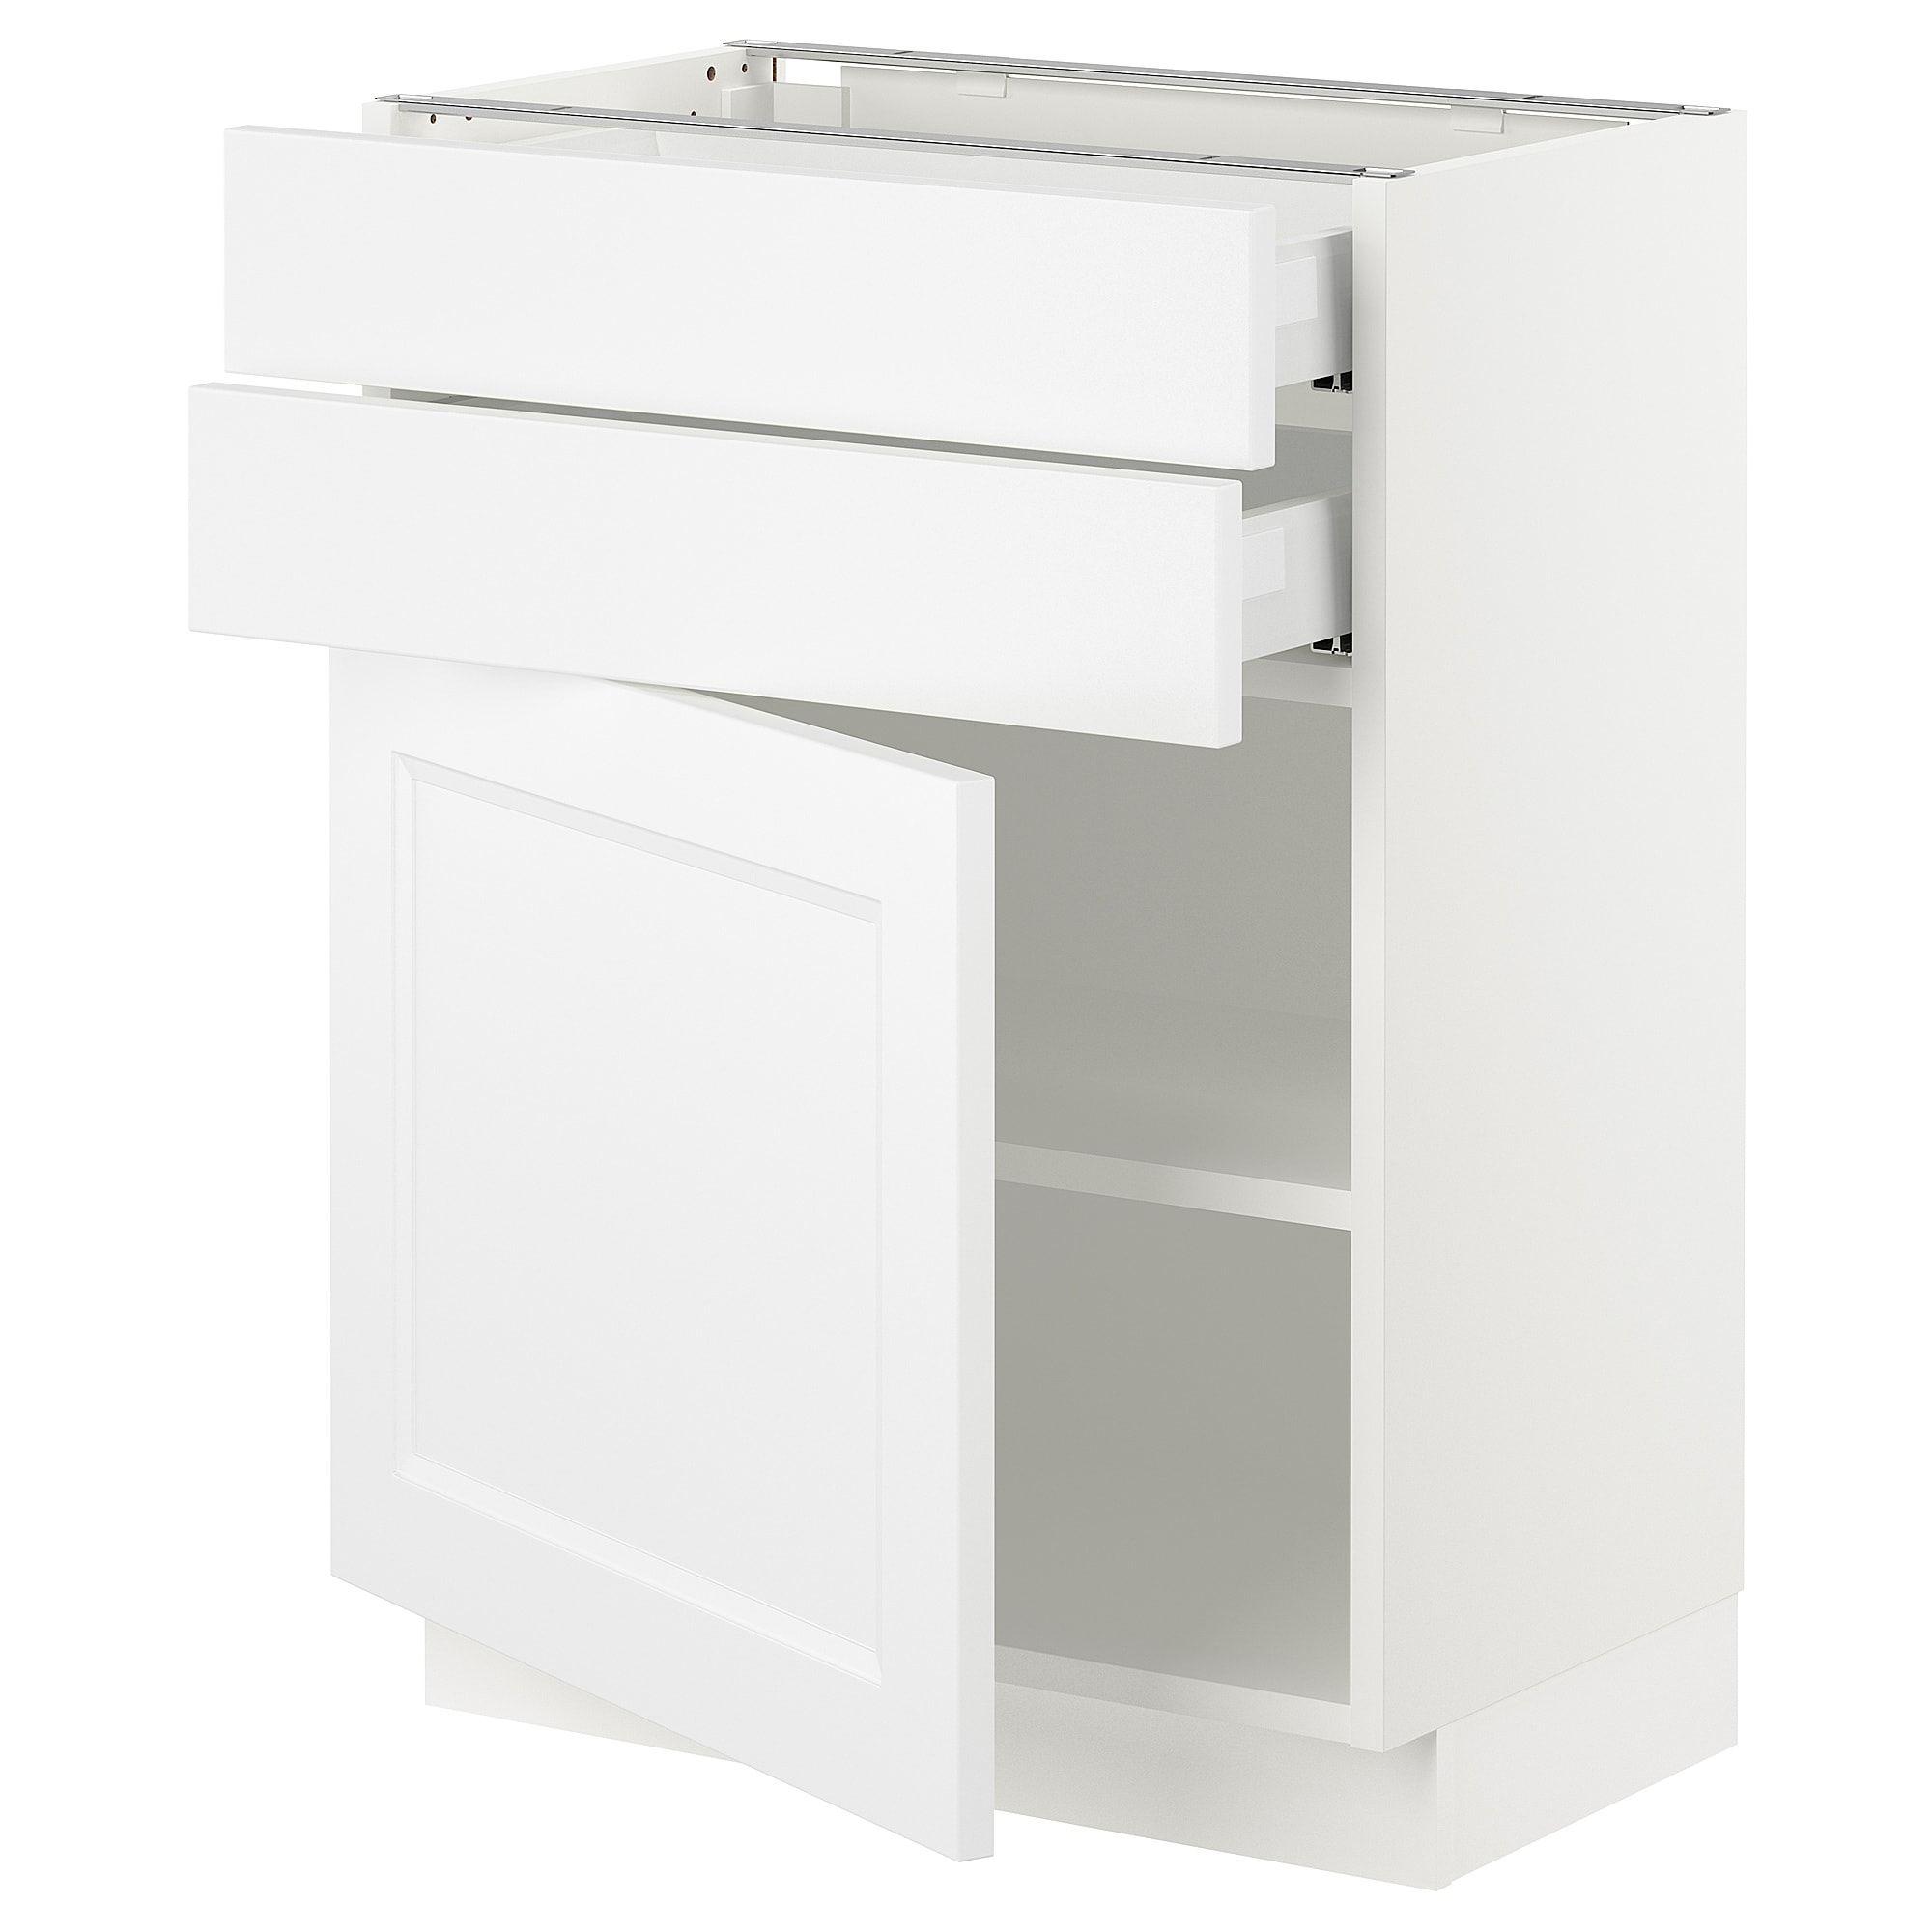 IKEA SEKTION white Base w/door & 2 drawers Frame